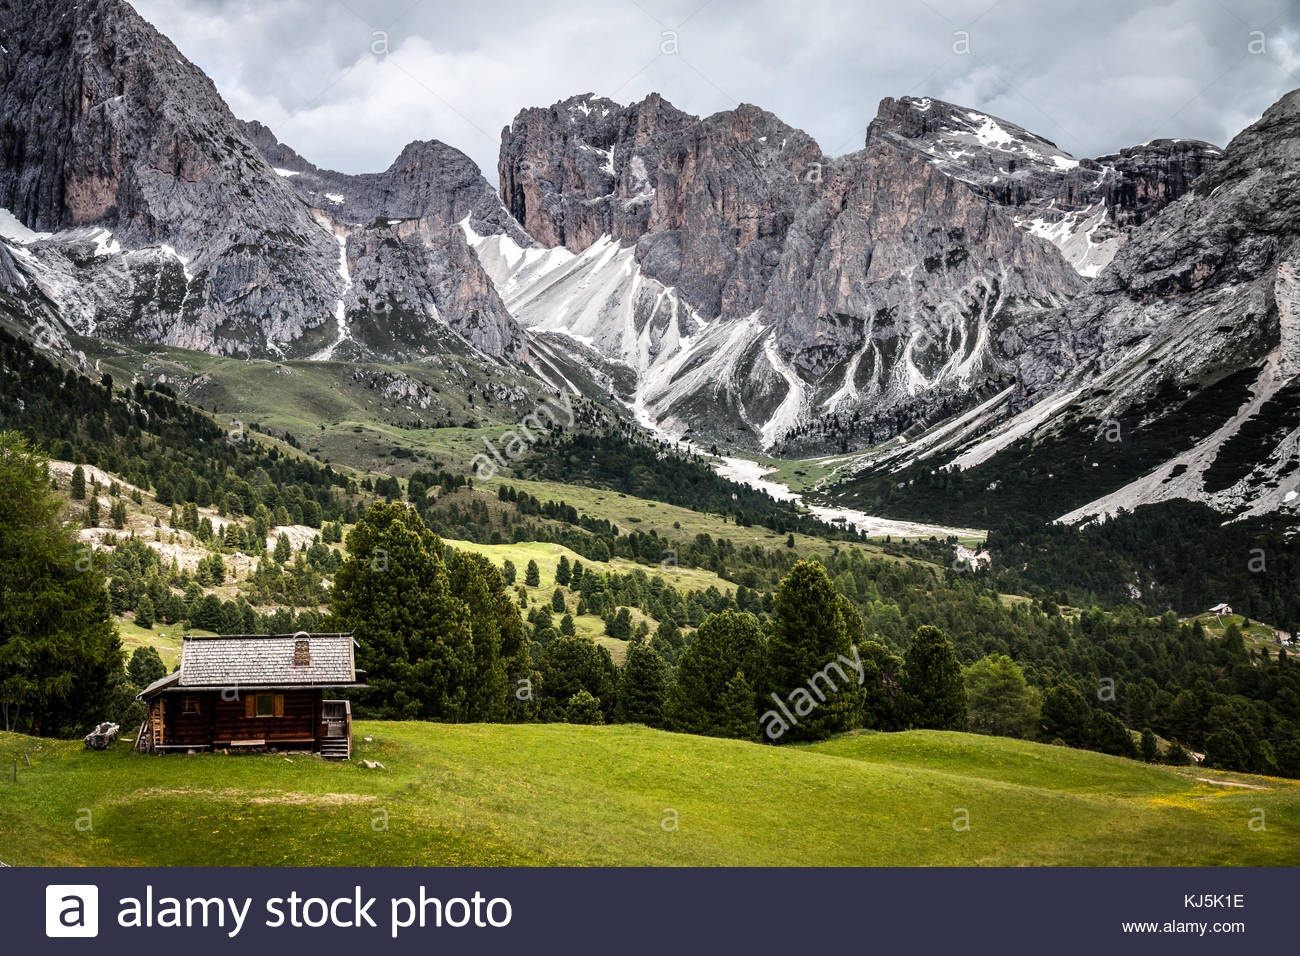 Chalet rodeado por el hermoso paisaje de montaña Imagen De Stock